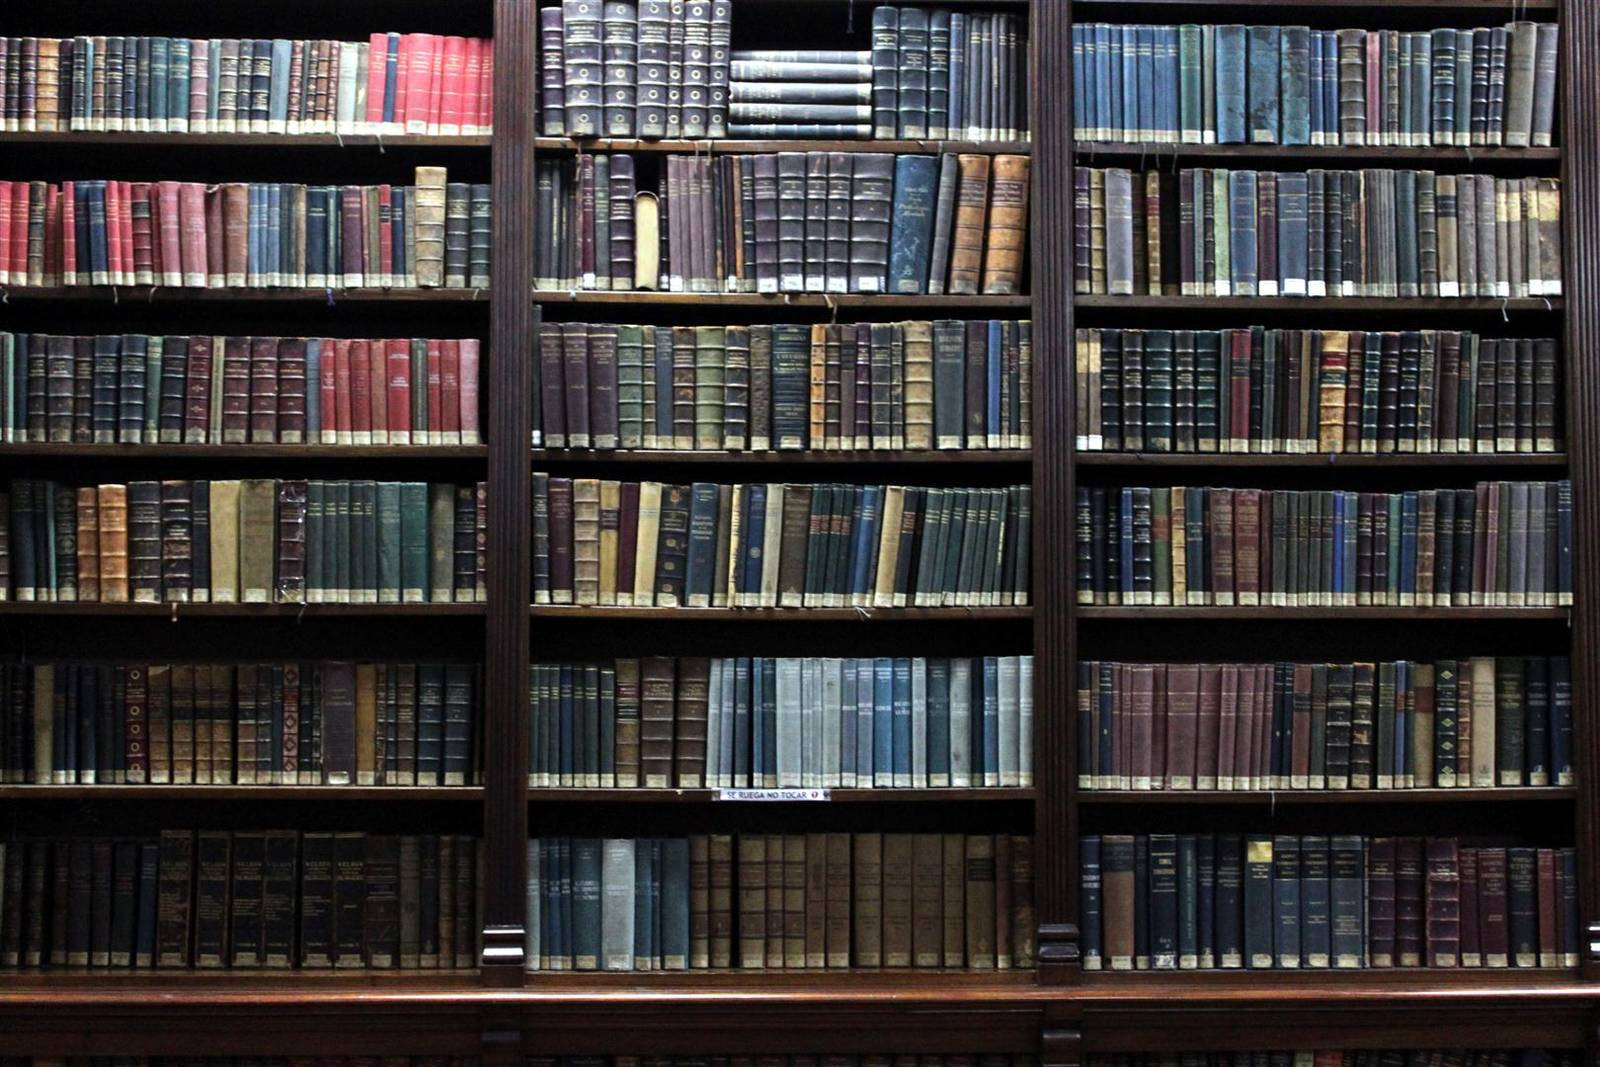 Estanter a de libros foto refugio antia reo for Estanterias para libros